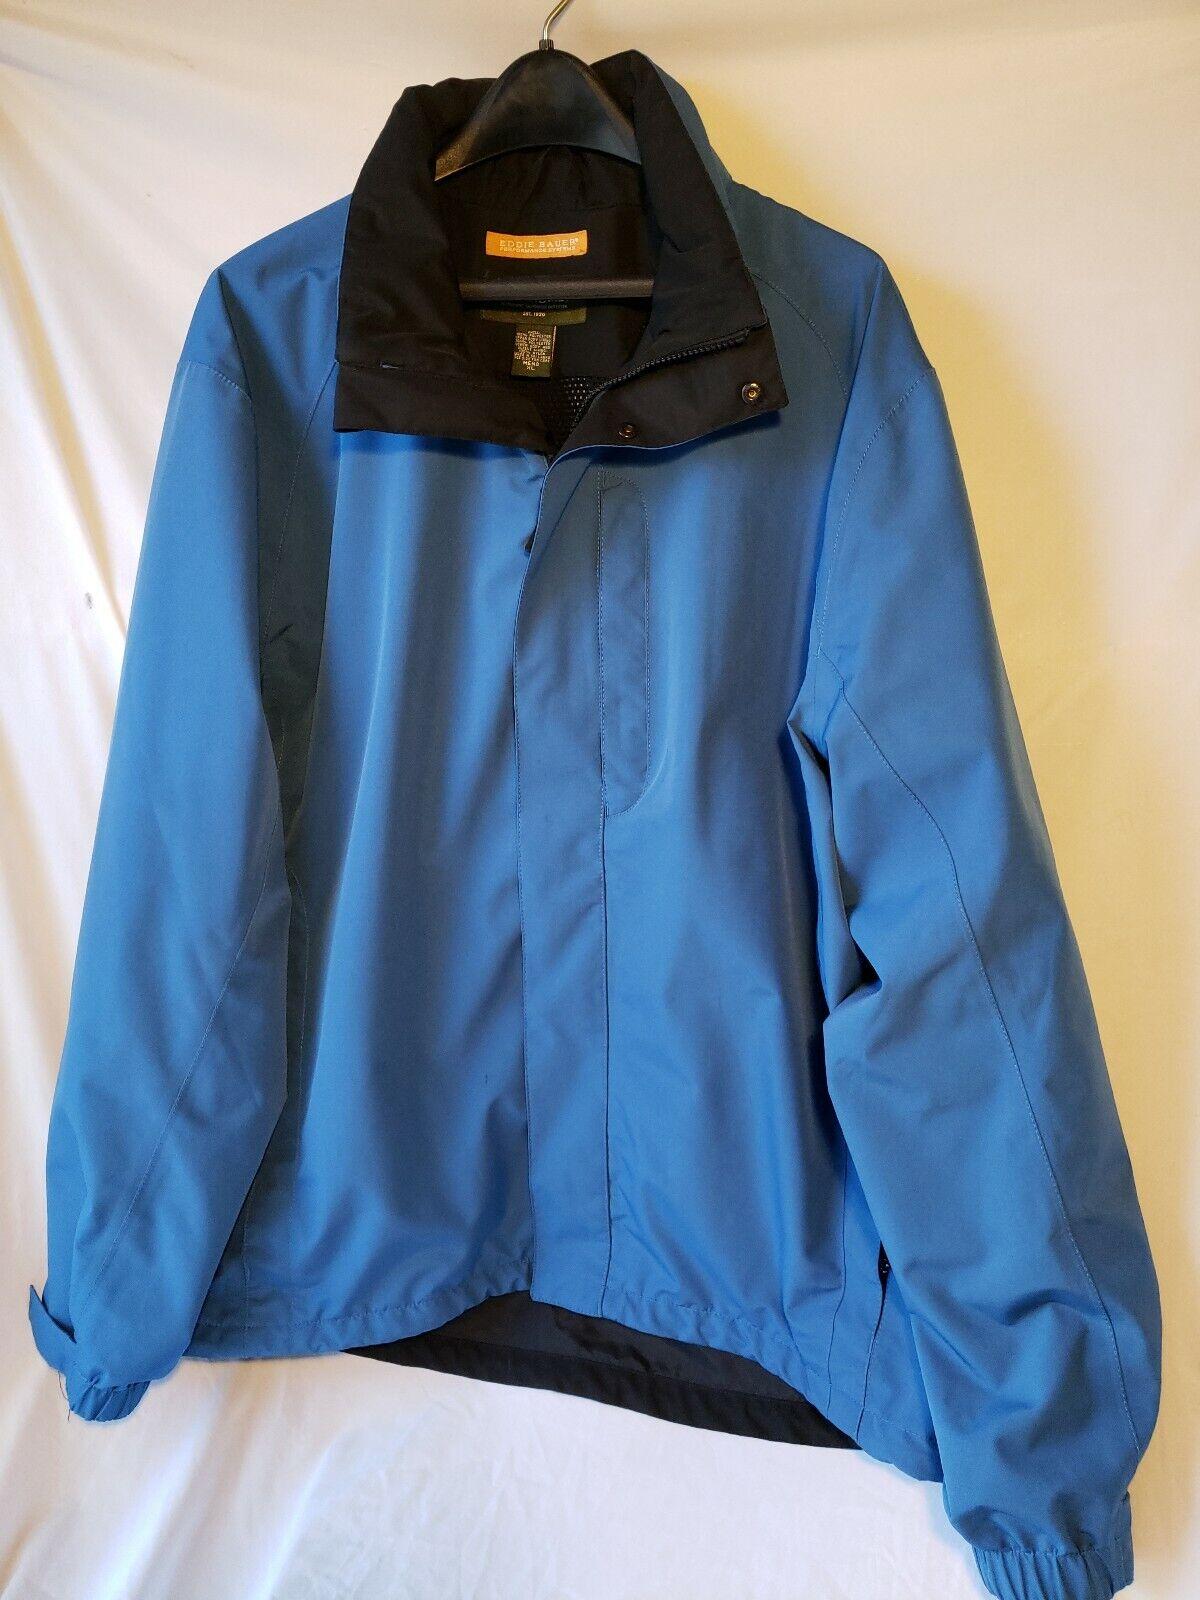 Eddie Bauer Mens XL Coat Performance Systems Zippered bluee  XLarge